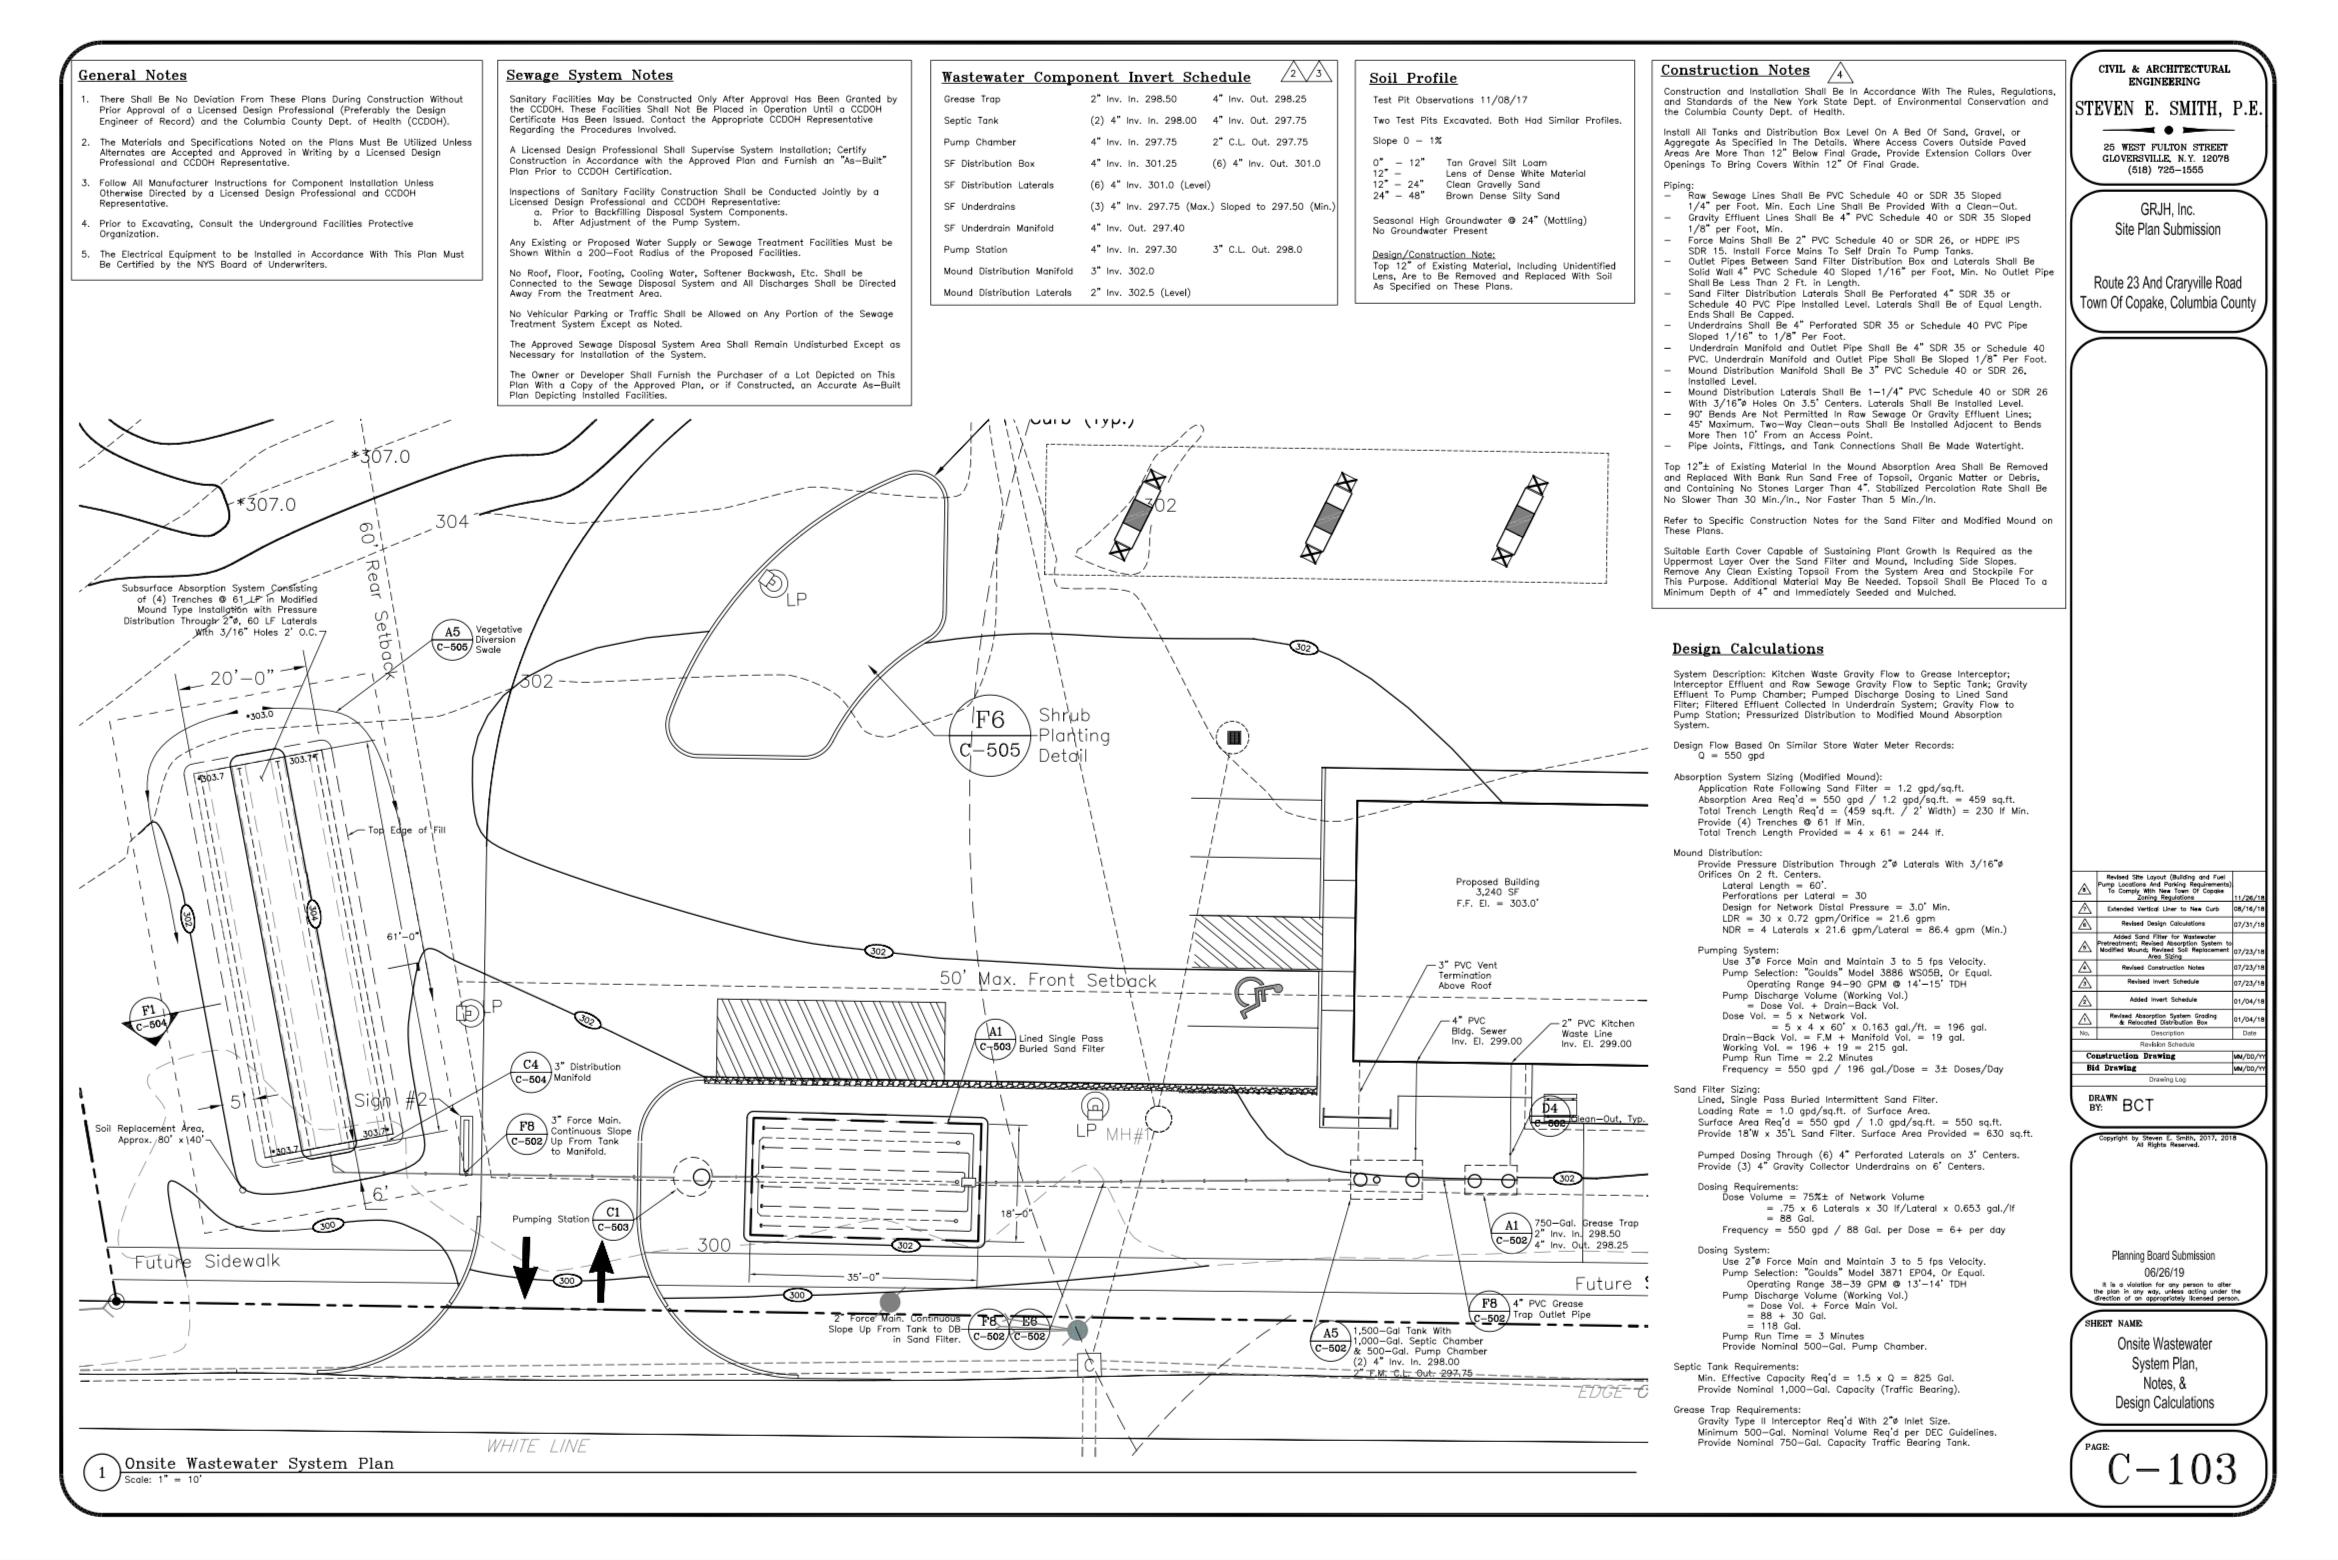 Site Plans GRJH Cobble Pond Gas Station_07.jpg